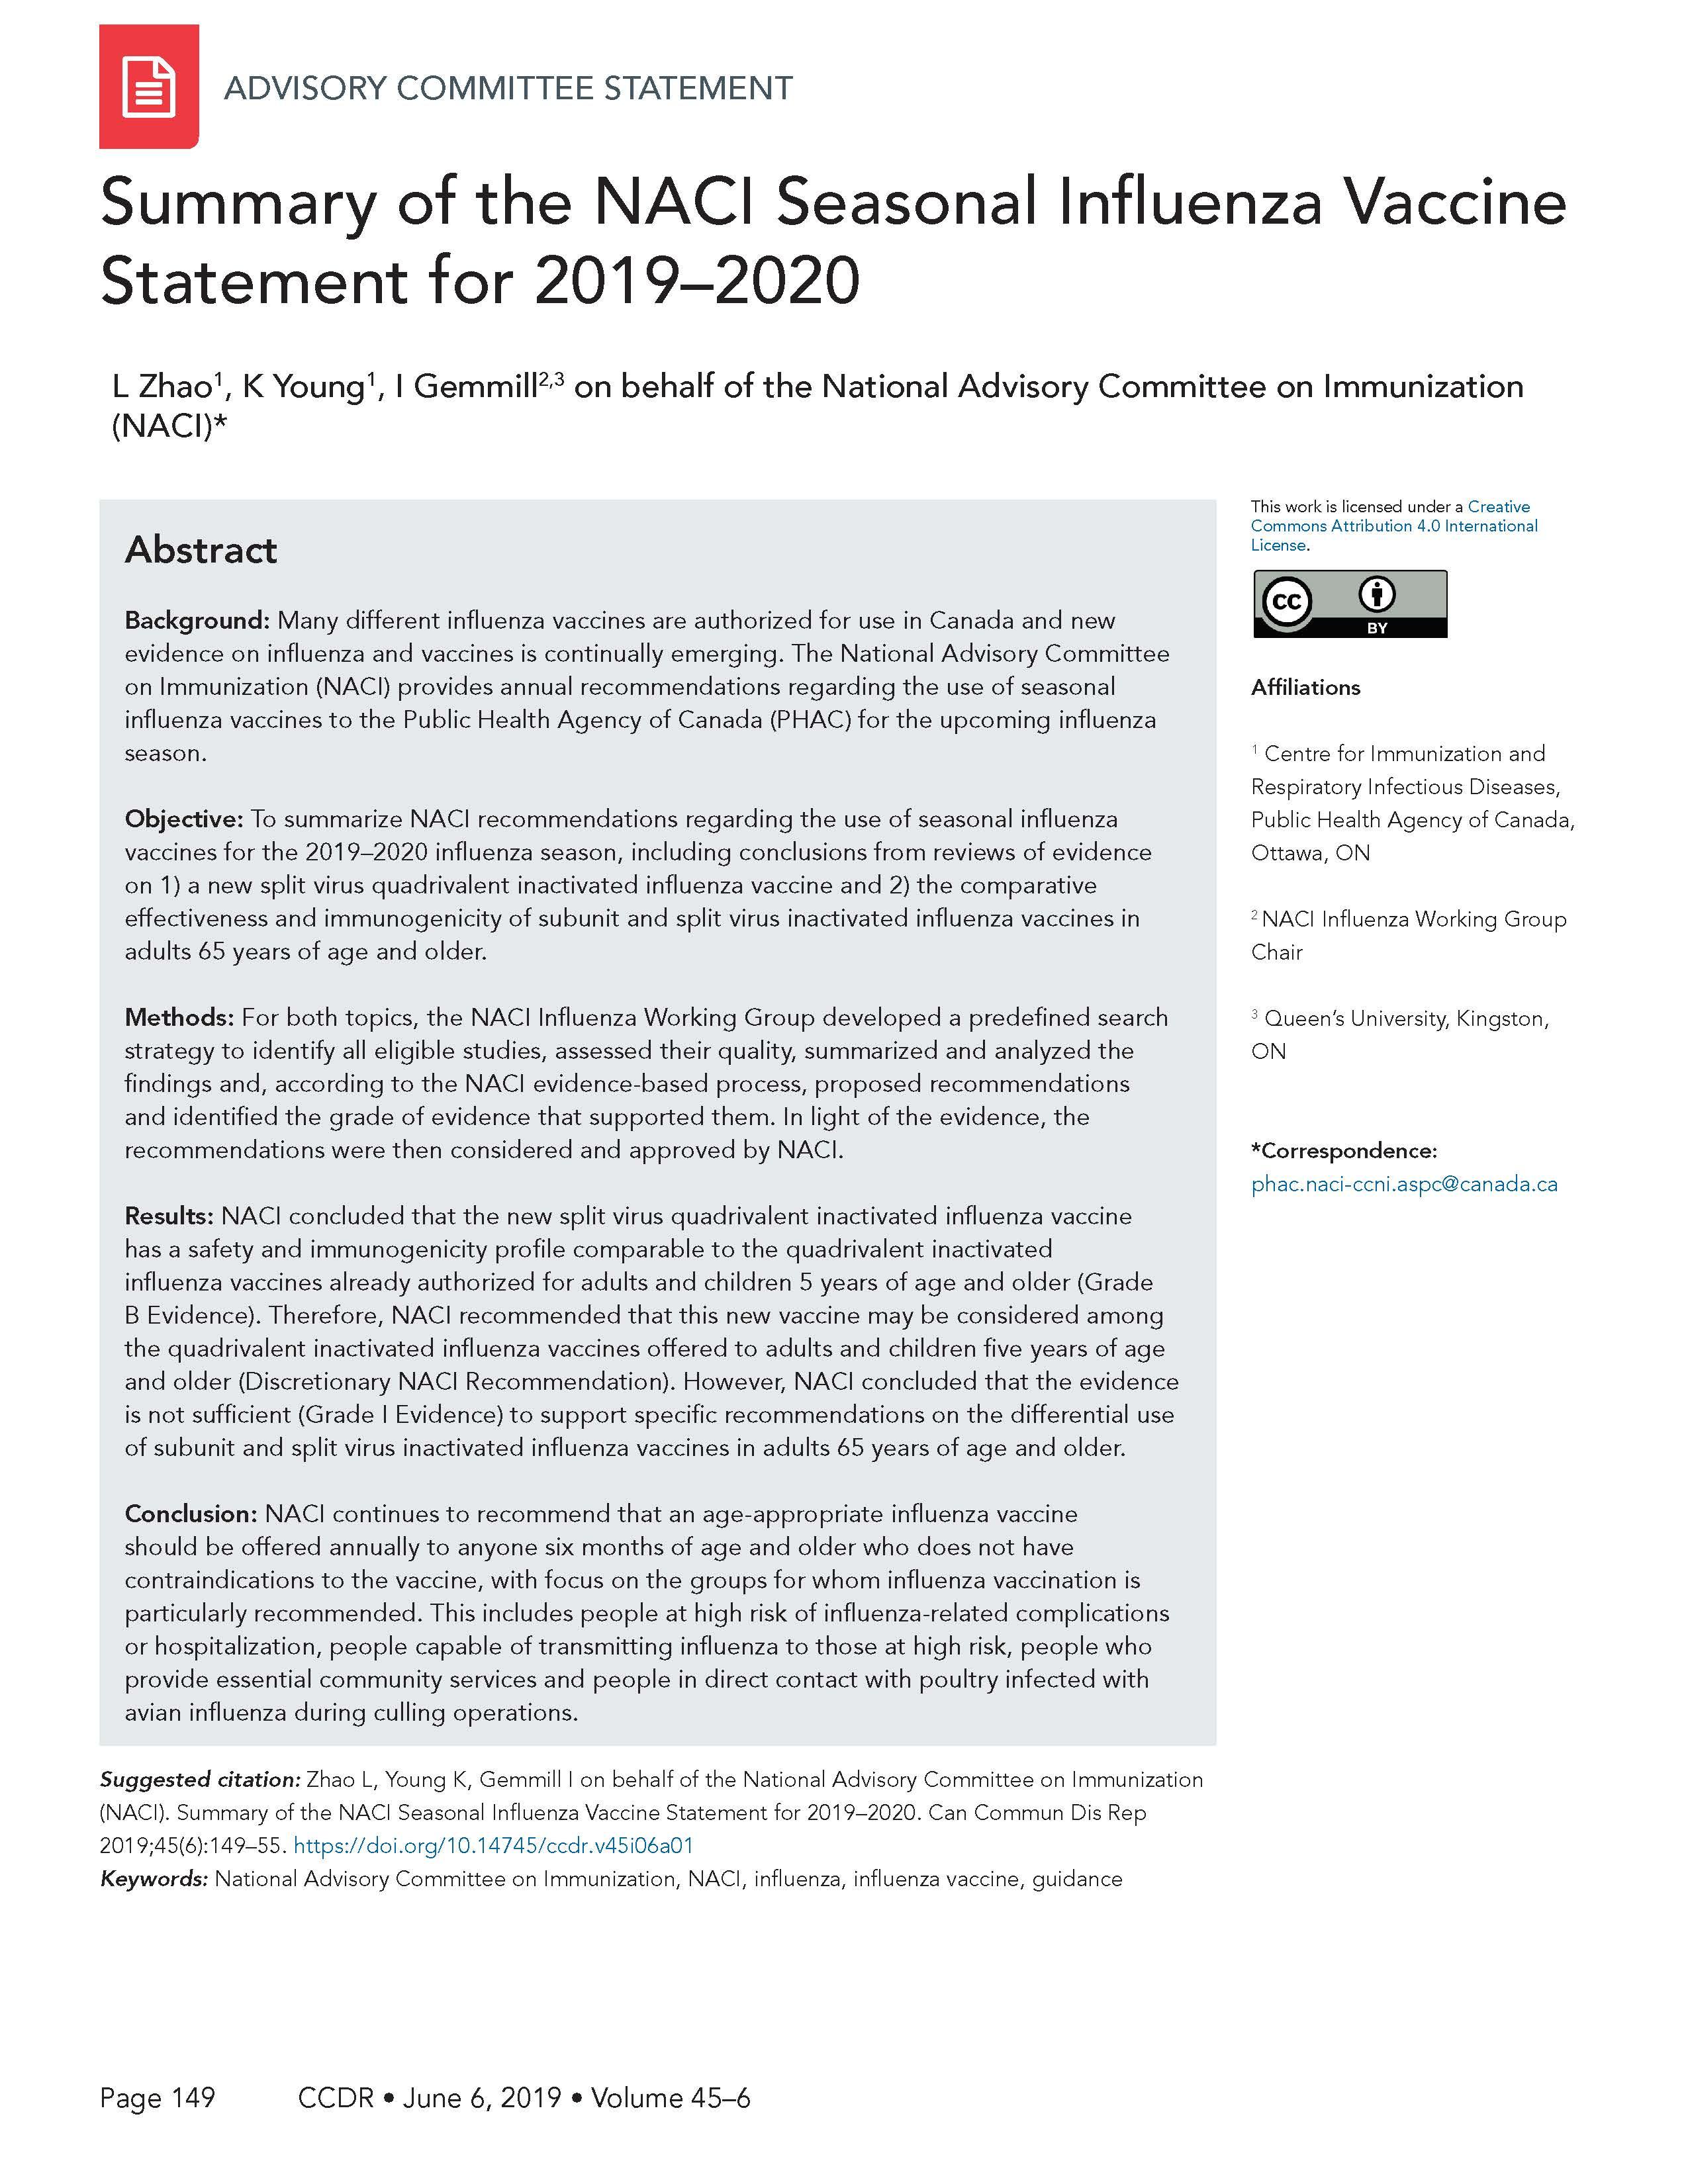 NACI seasonal influenza vaccine statement for 2019–2020, CCDR 45(6 ...